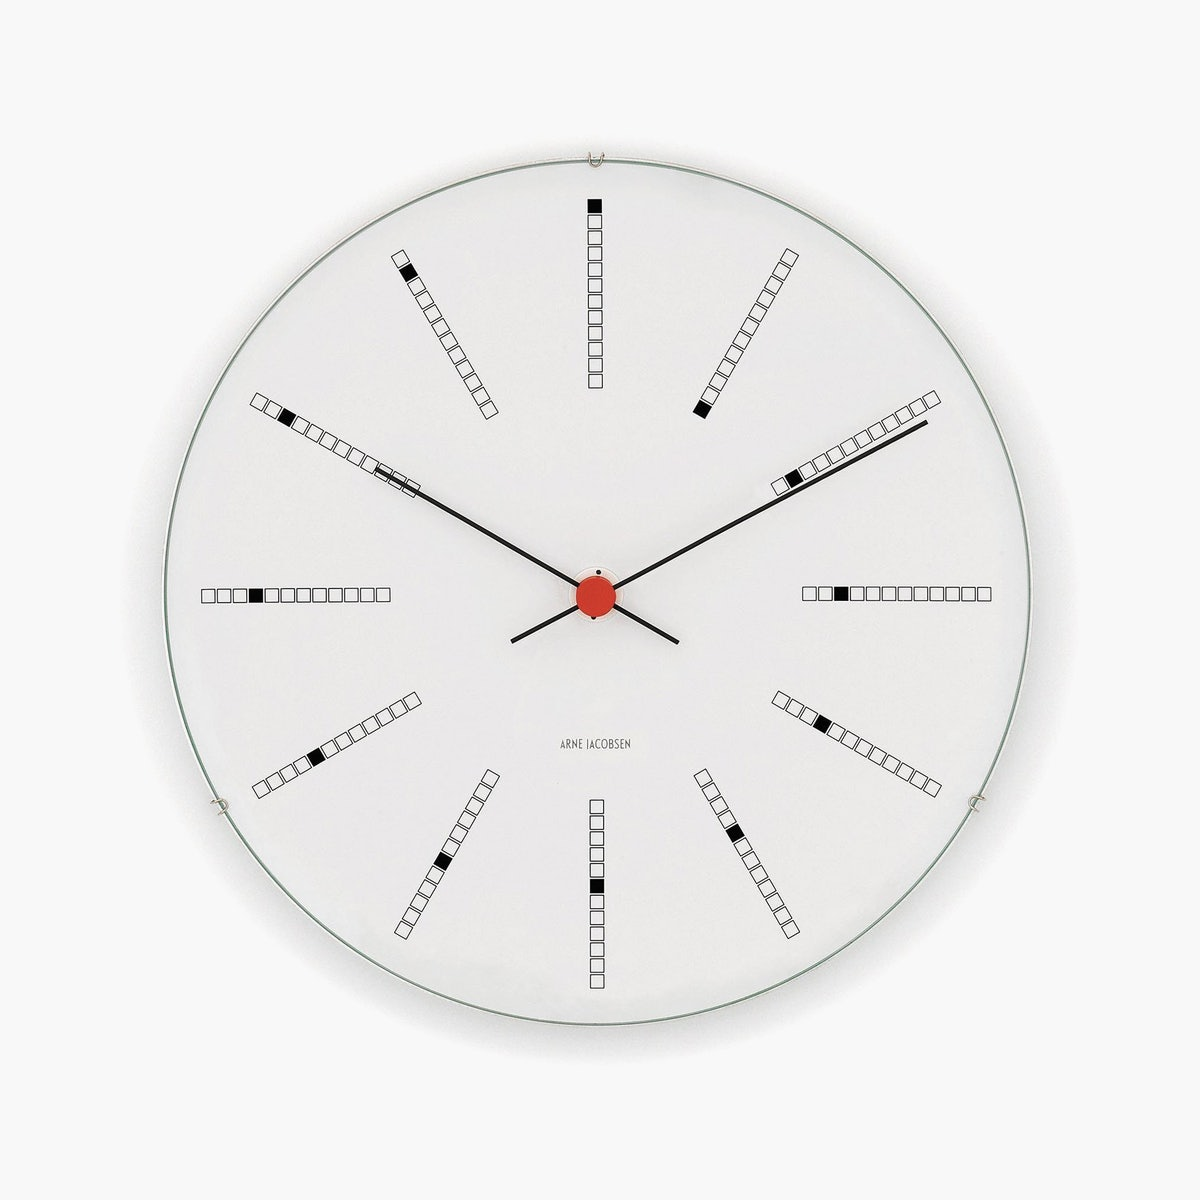 Banker's Wall Clock